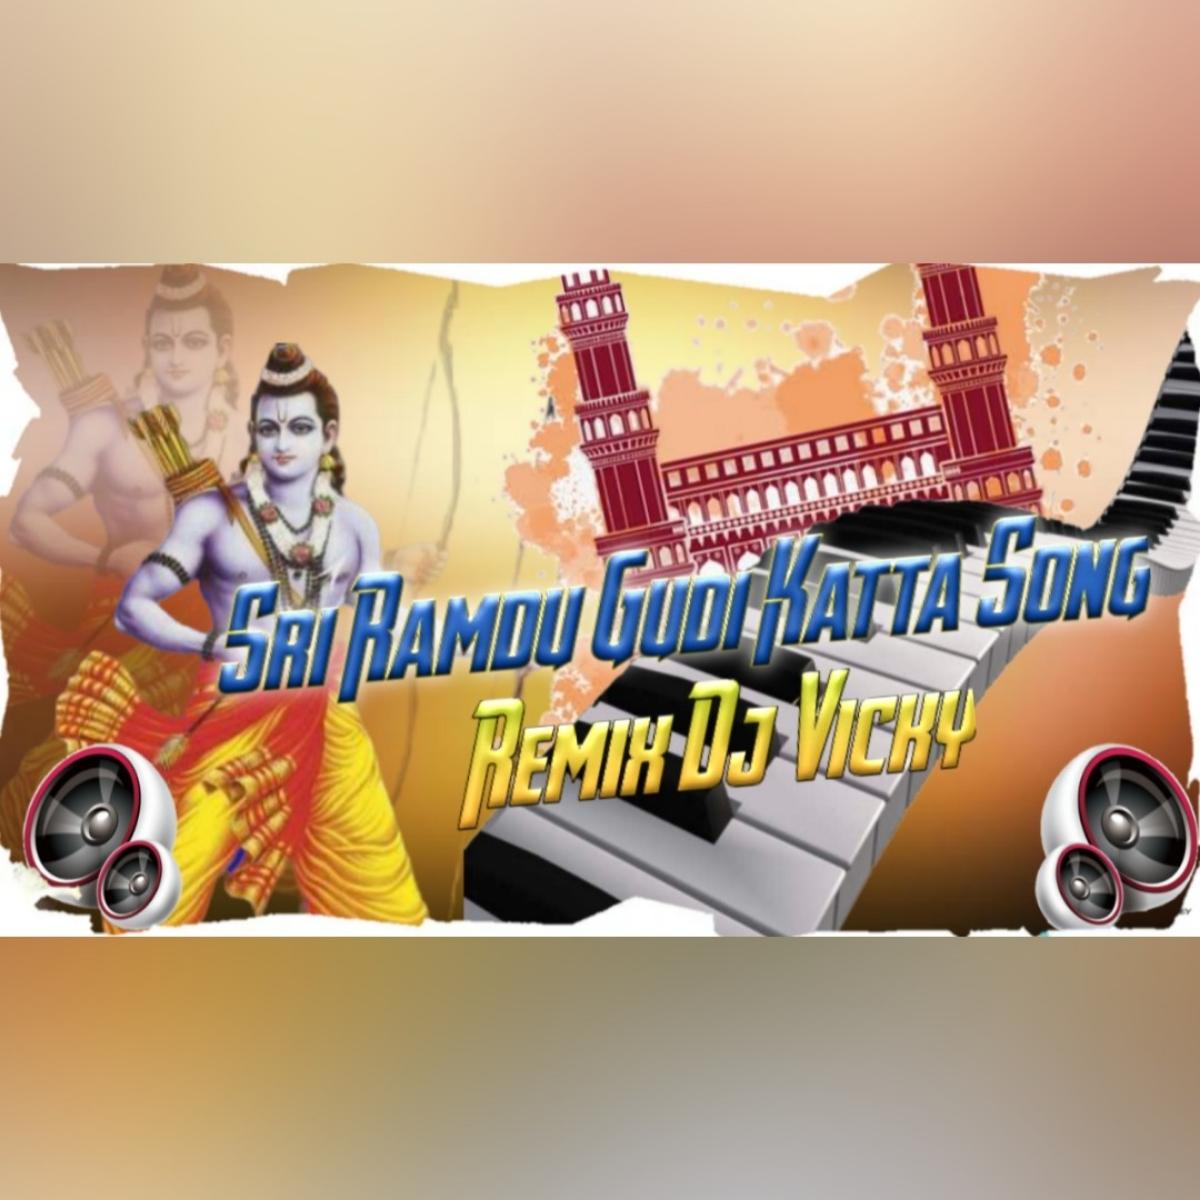 Sri Ramdu Gudi Katta Song Remix Dj Vicky [NEWDJSWORLD.IN]